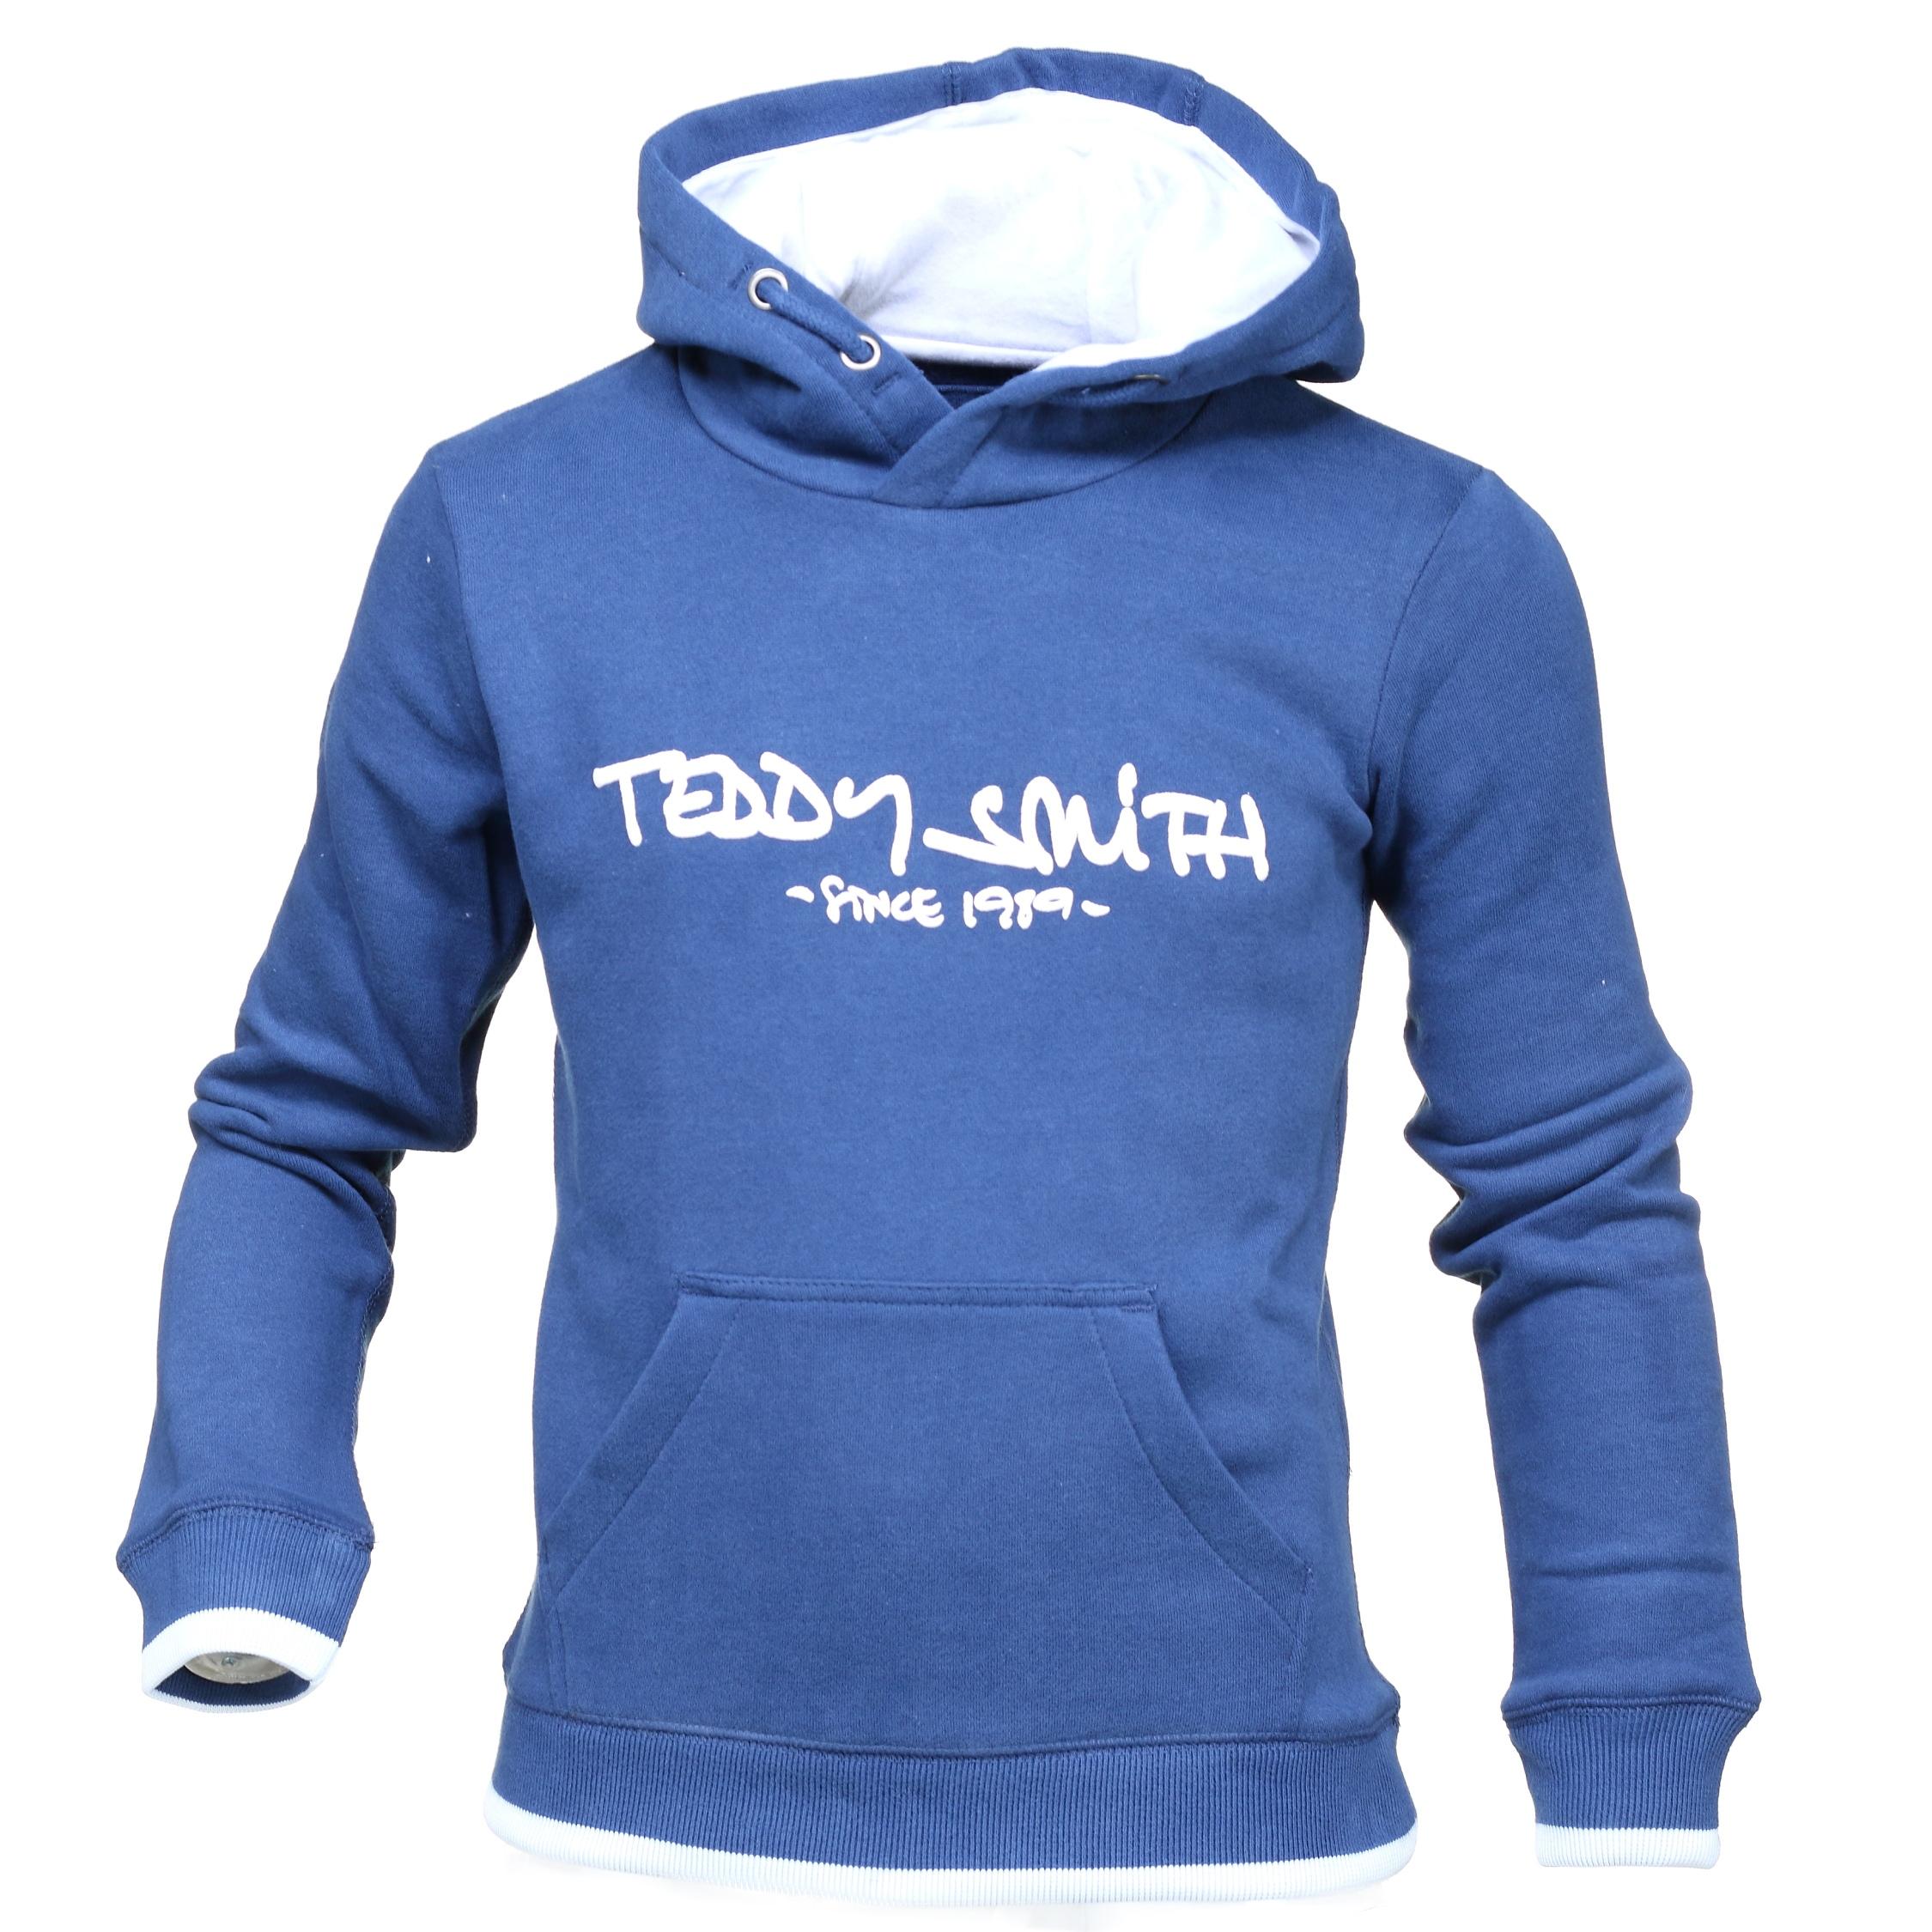 http://www.leadermode.com/153943/teddy-smith-siclass-hoody-jr-60815916-352b-estate-blue.jpg